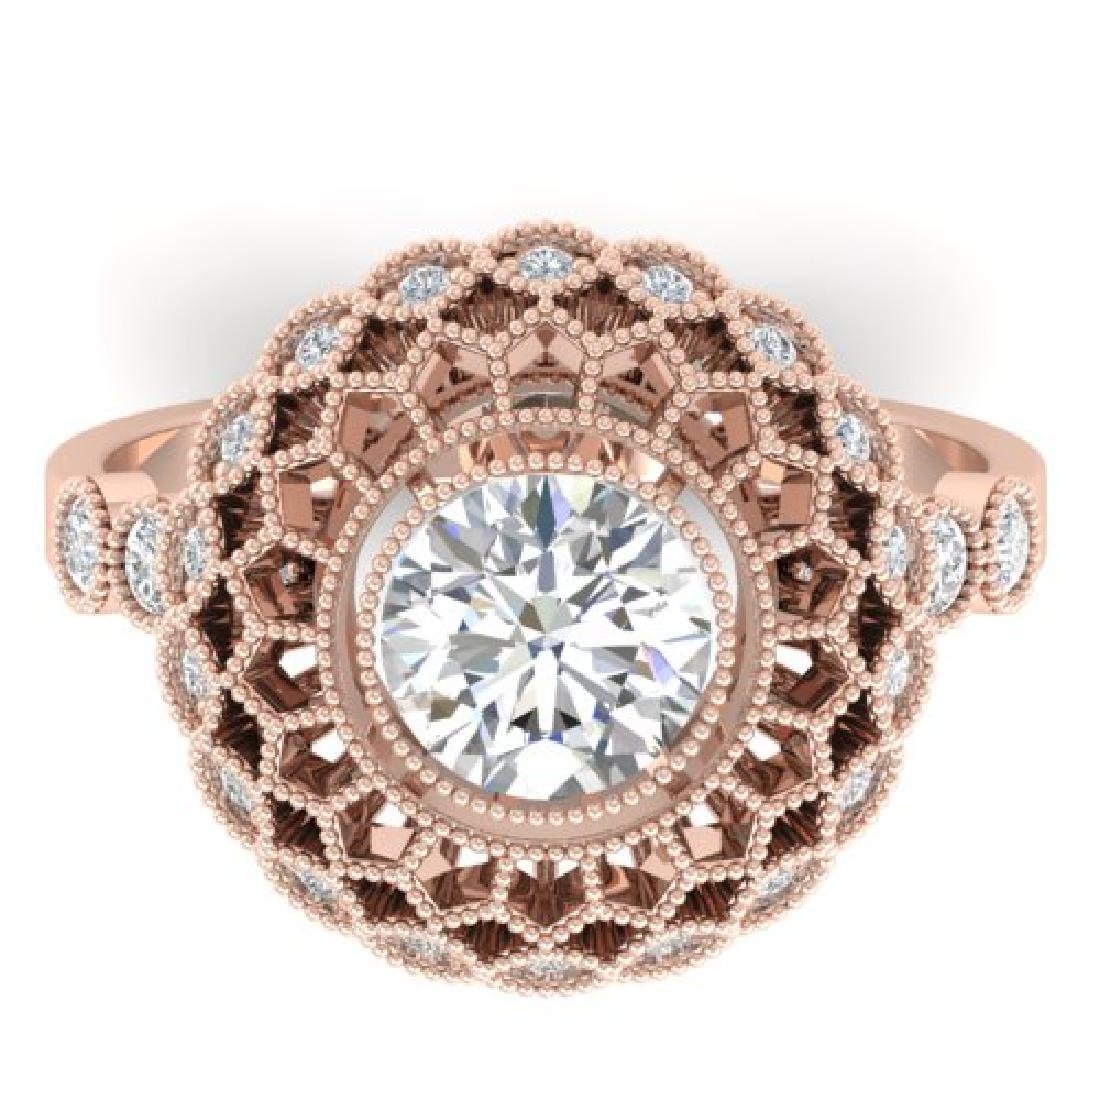 1.5 CTW Certified VS/SI Diamond Art Deco Ring 18K Rose